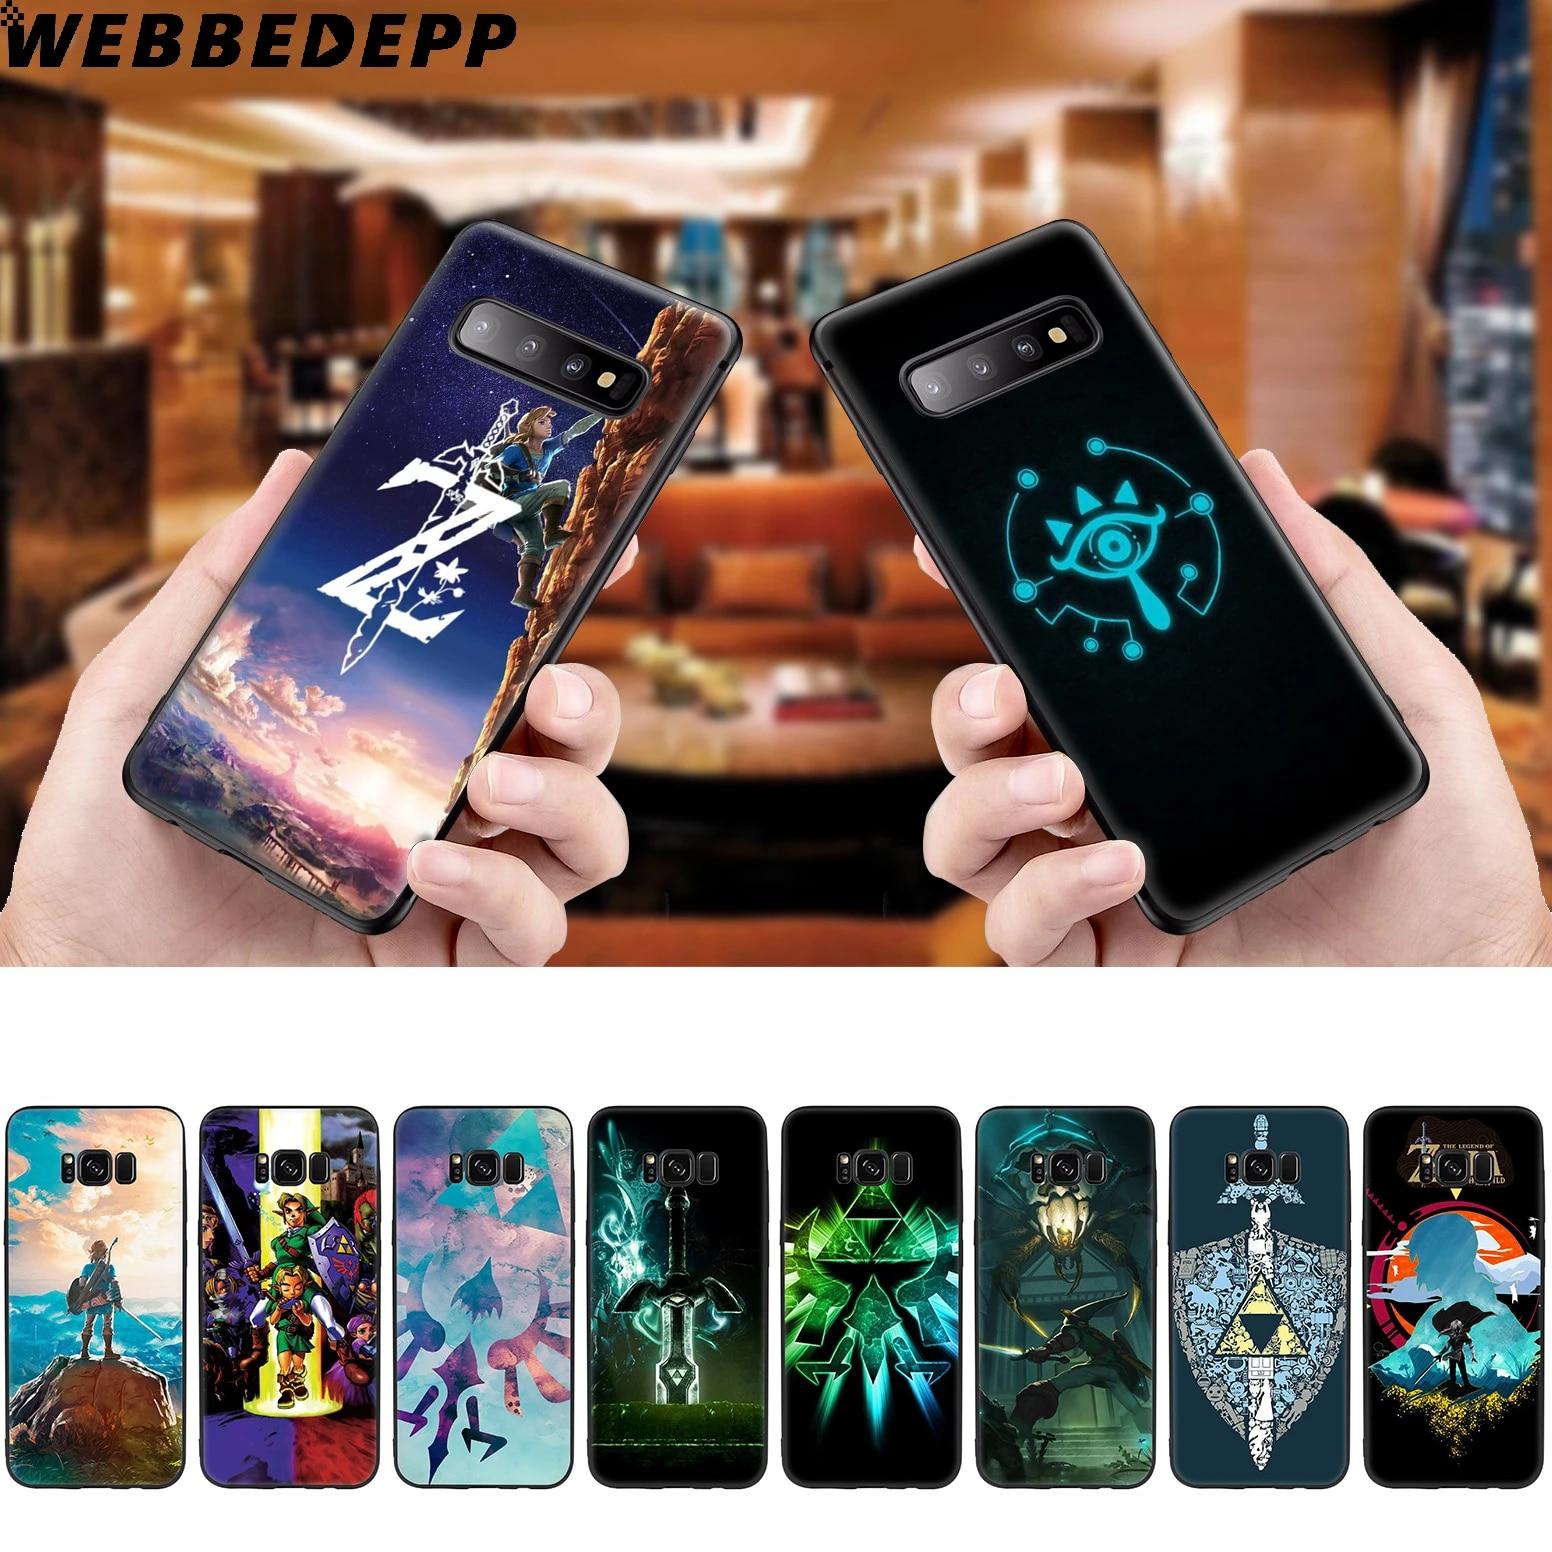 WEBBEDEPP la légende de Zelda coque souple pour Samsung Galaxy S10 S10e S9 S8 Plus S7 S6 Edge S9 Plus & J6 2018 Note 10 Plus 9 8